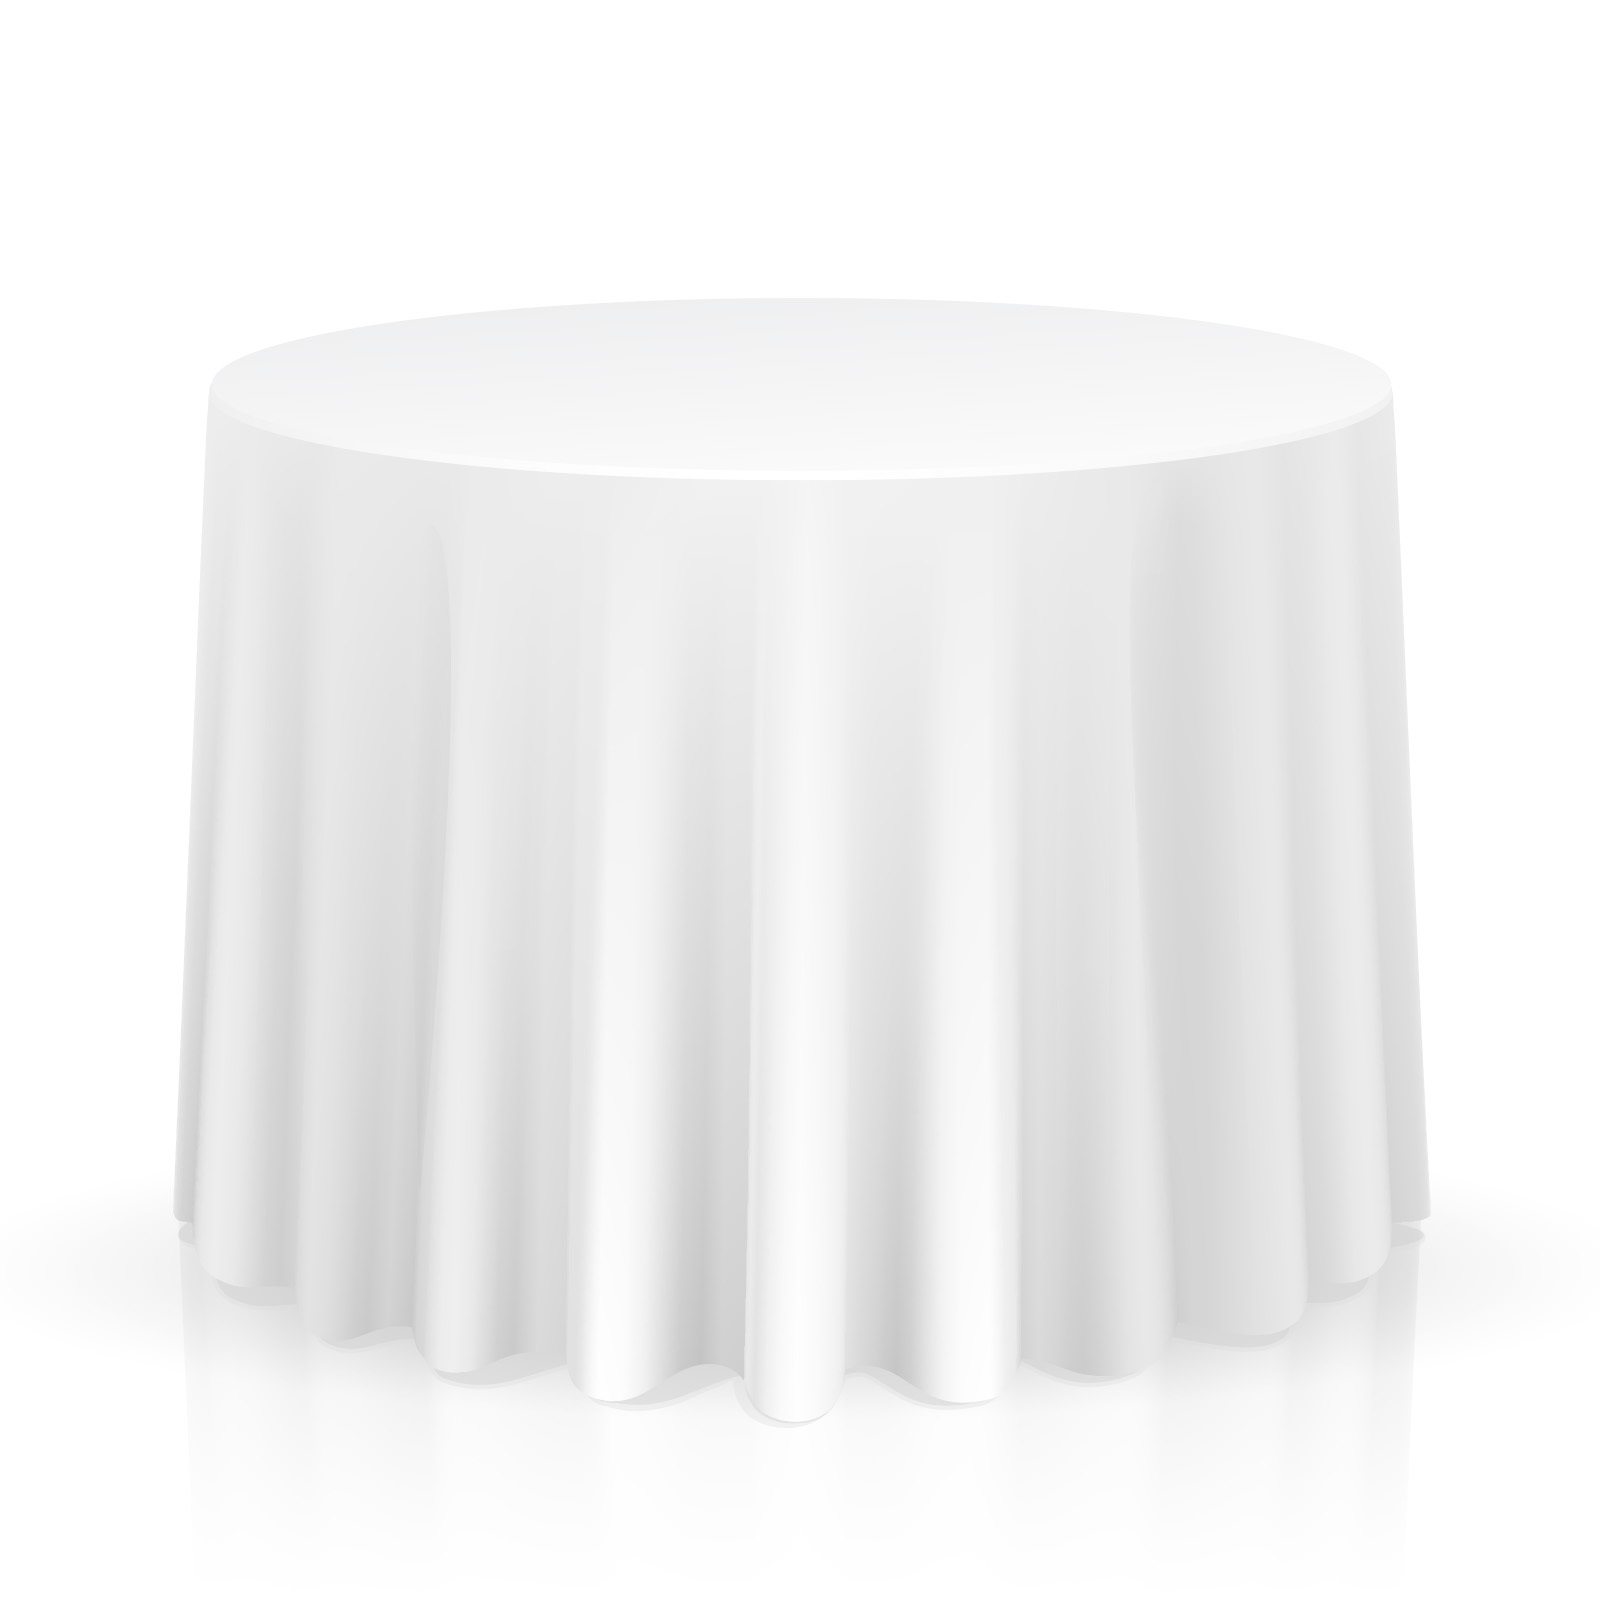 Lann's Linens 20 Premium Round Tablecloths for Wedding   Banquet   Restaurant Polyester... by Lann's Linens